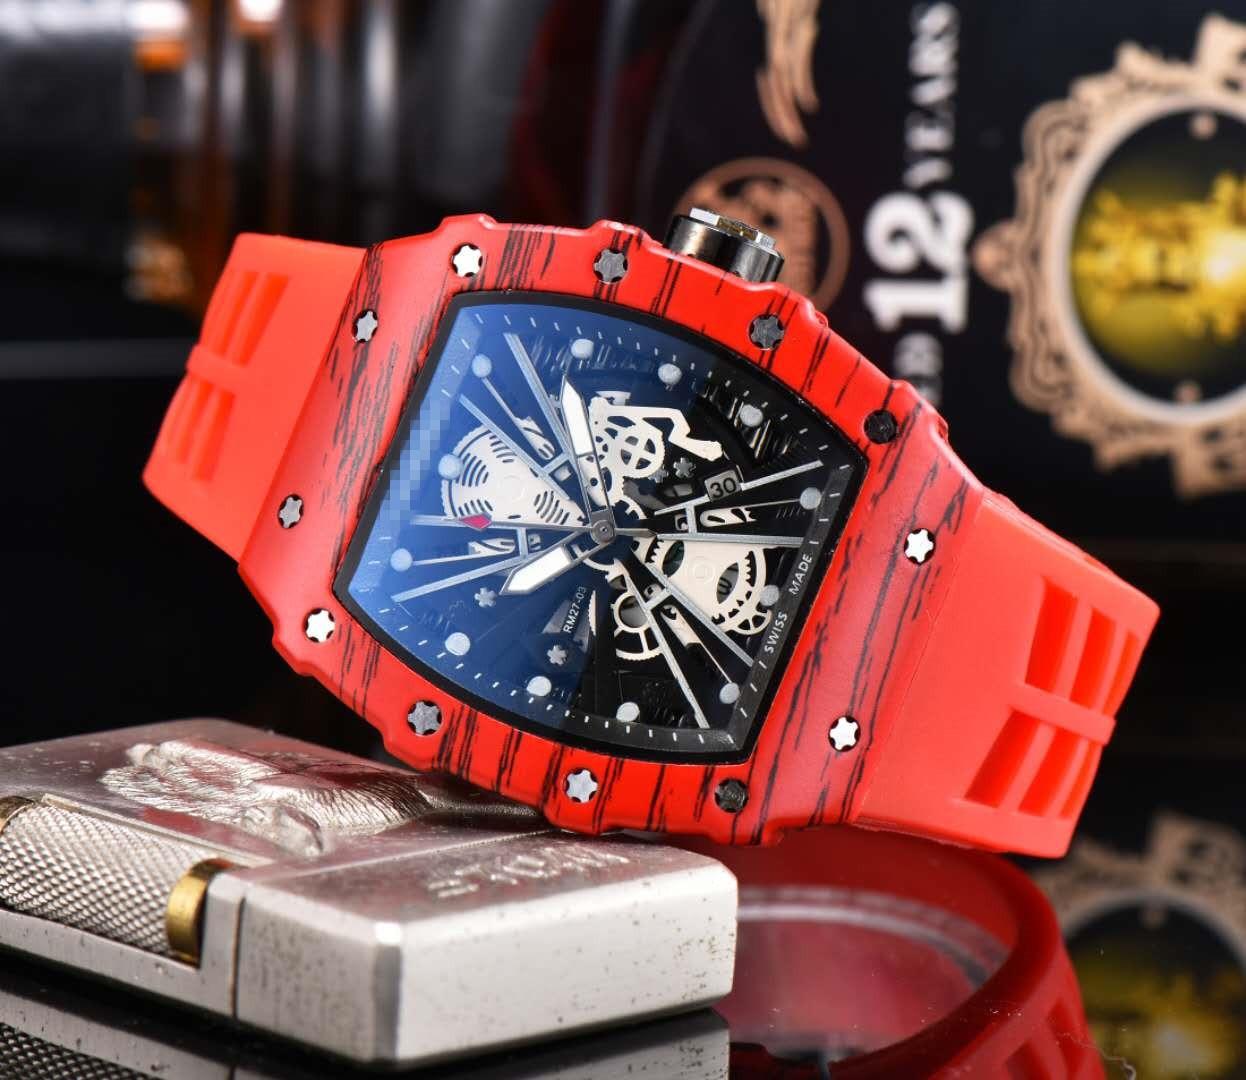 Relógio masculino rm richard relógios de quartzo de luxo marca superior mille relógio masculino designer wristwacth resistente à água reloj hombre